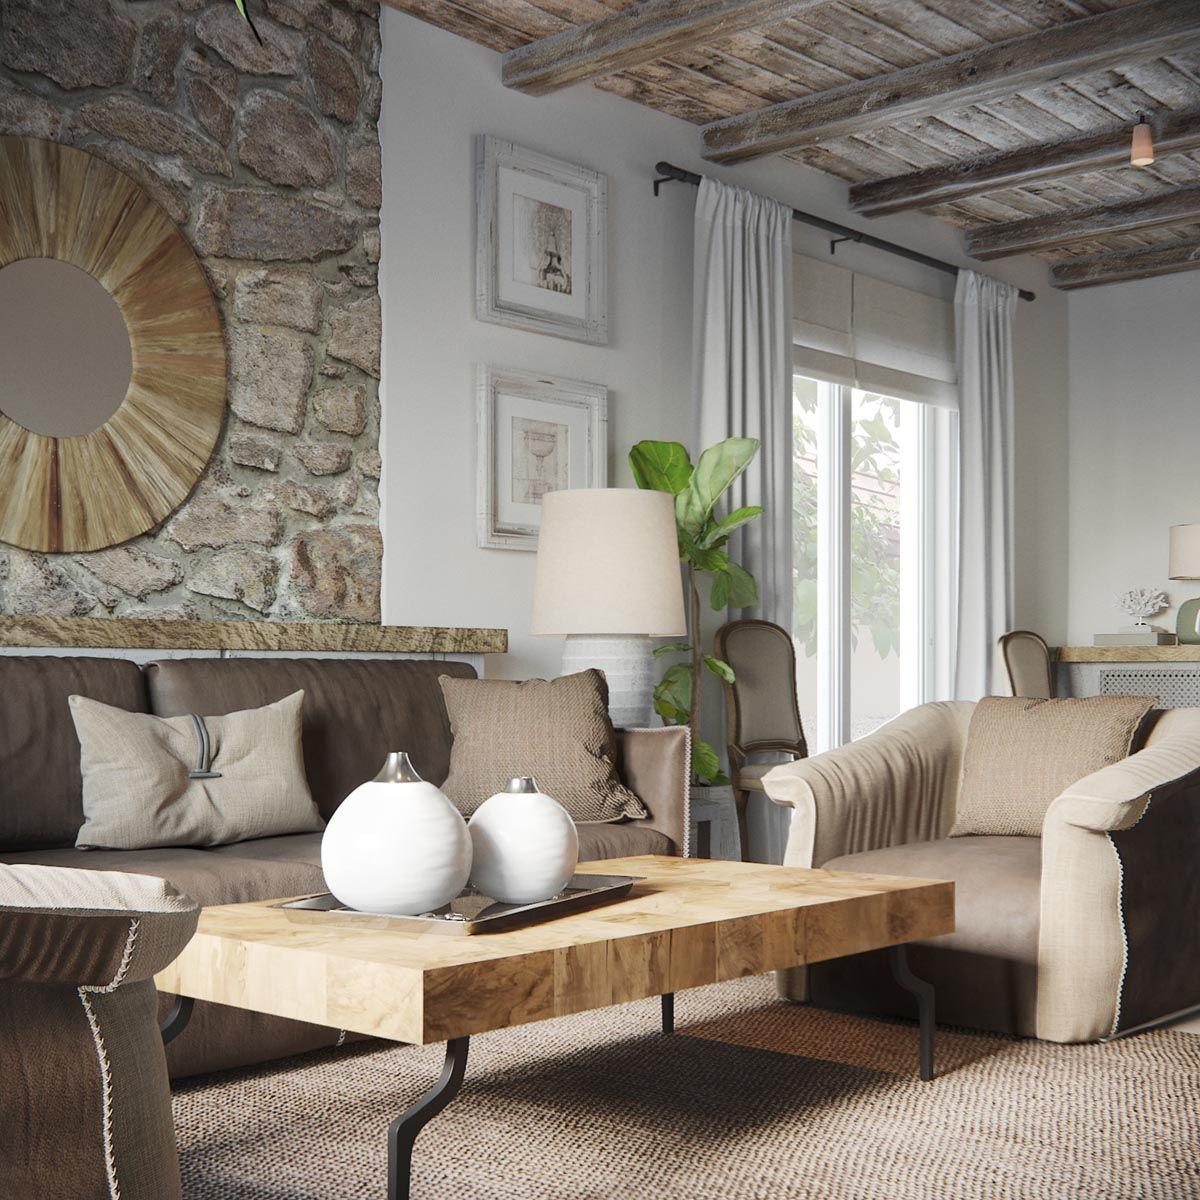 Attractive 2 Homes In Mediterranean Rustic Chic